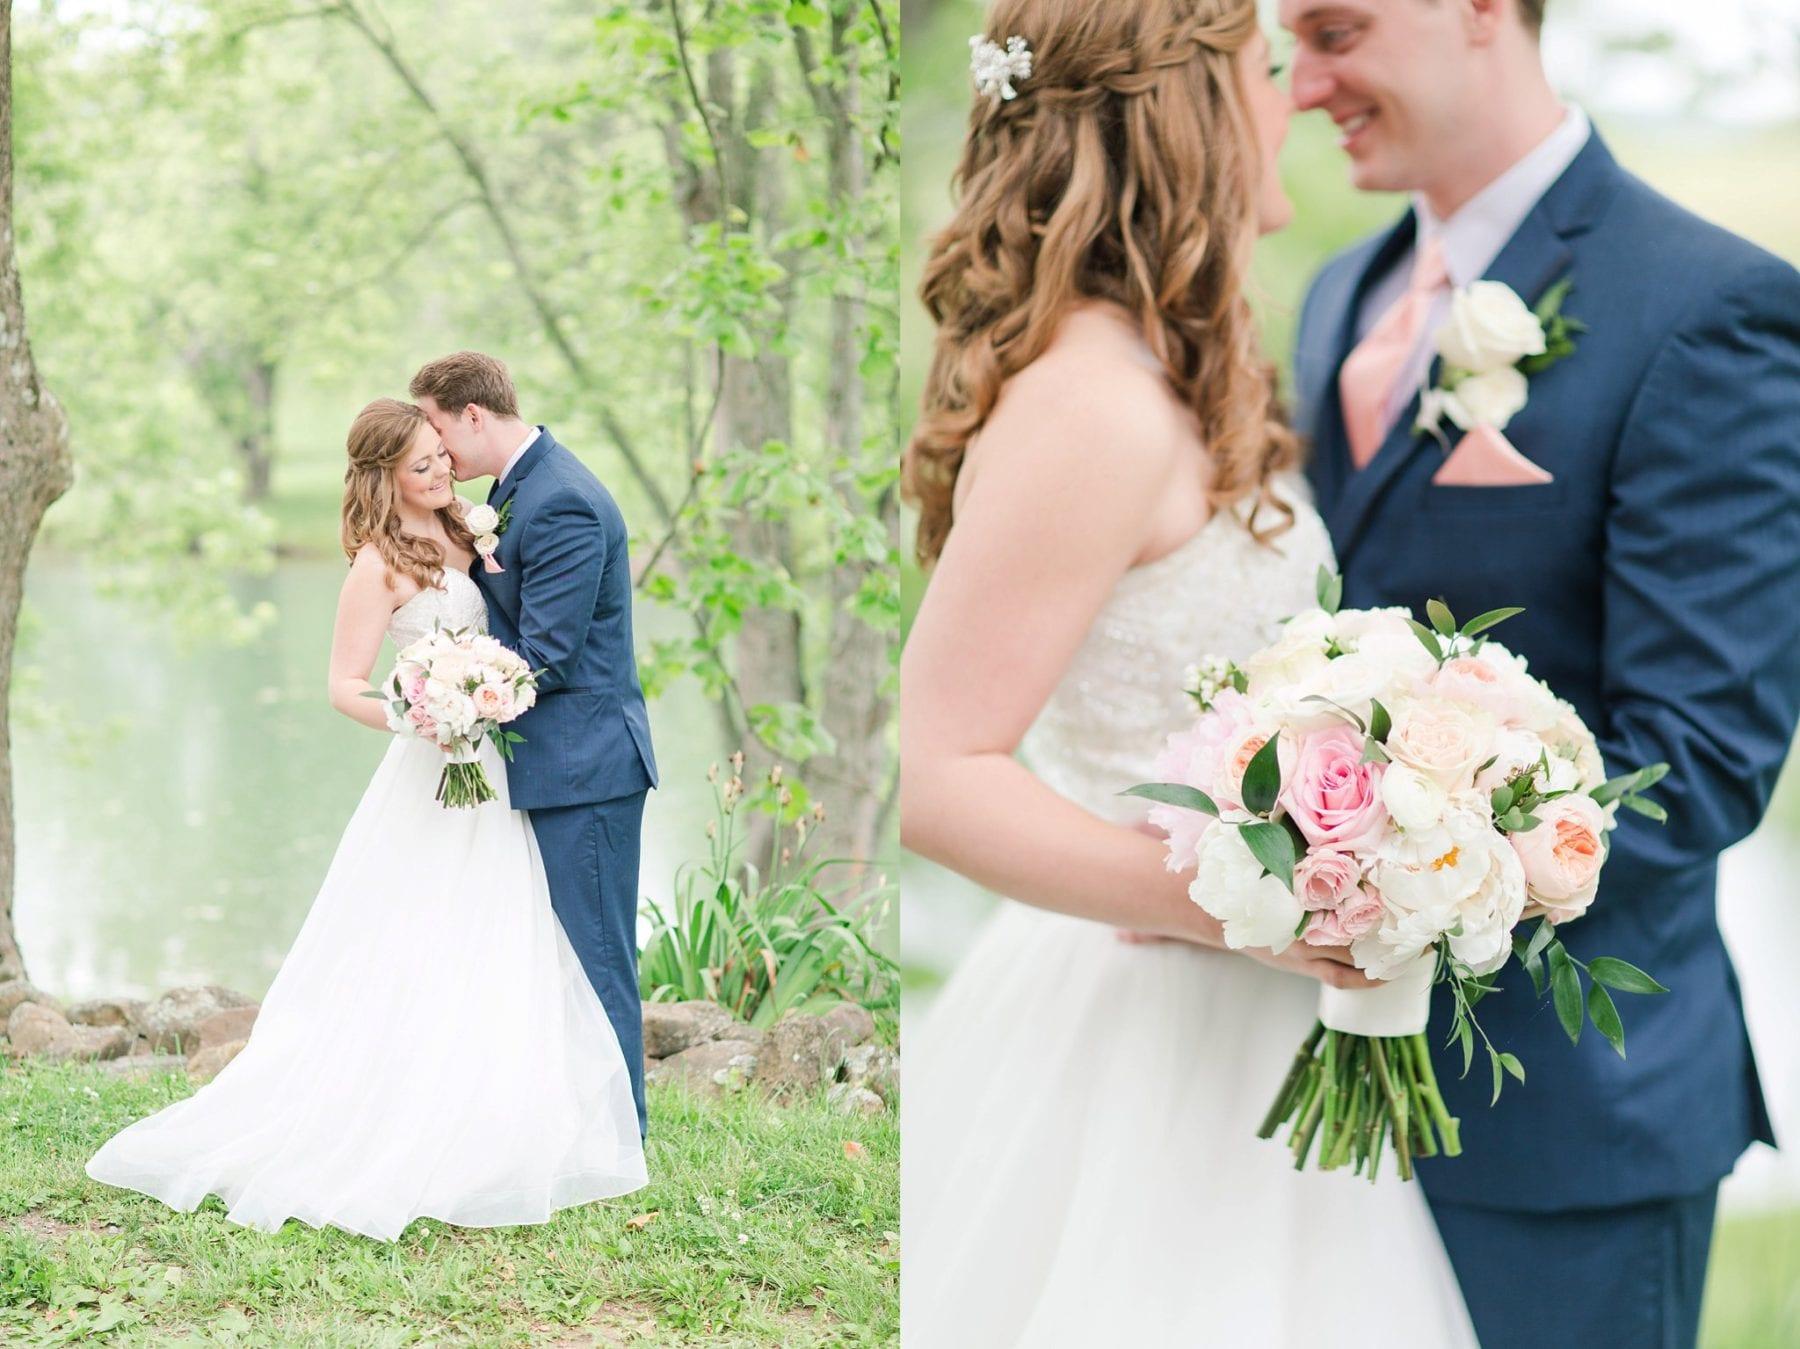 Justin & Megan Big Spring Farm Wedding Photos-98.jpg